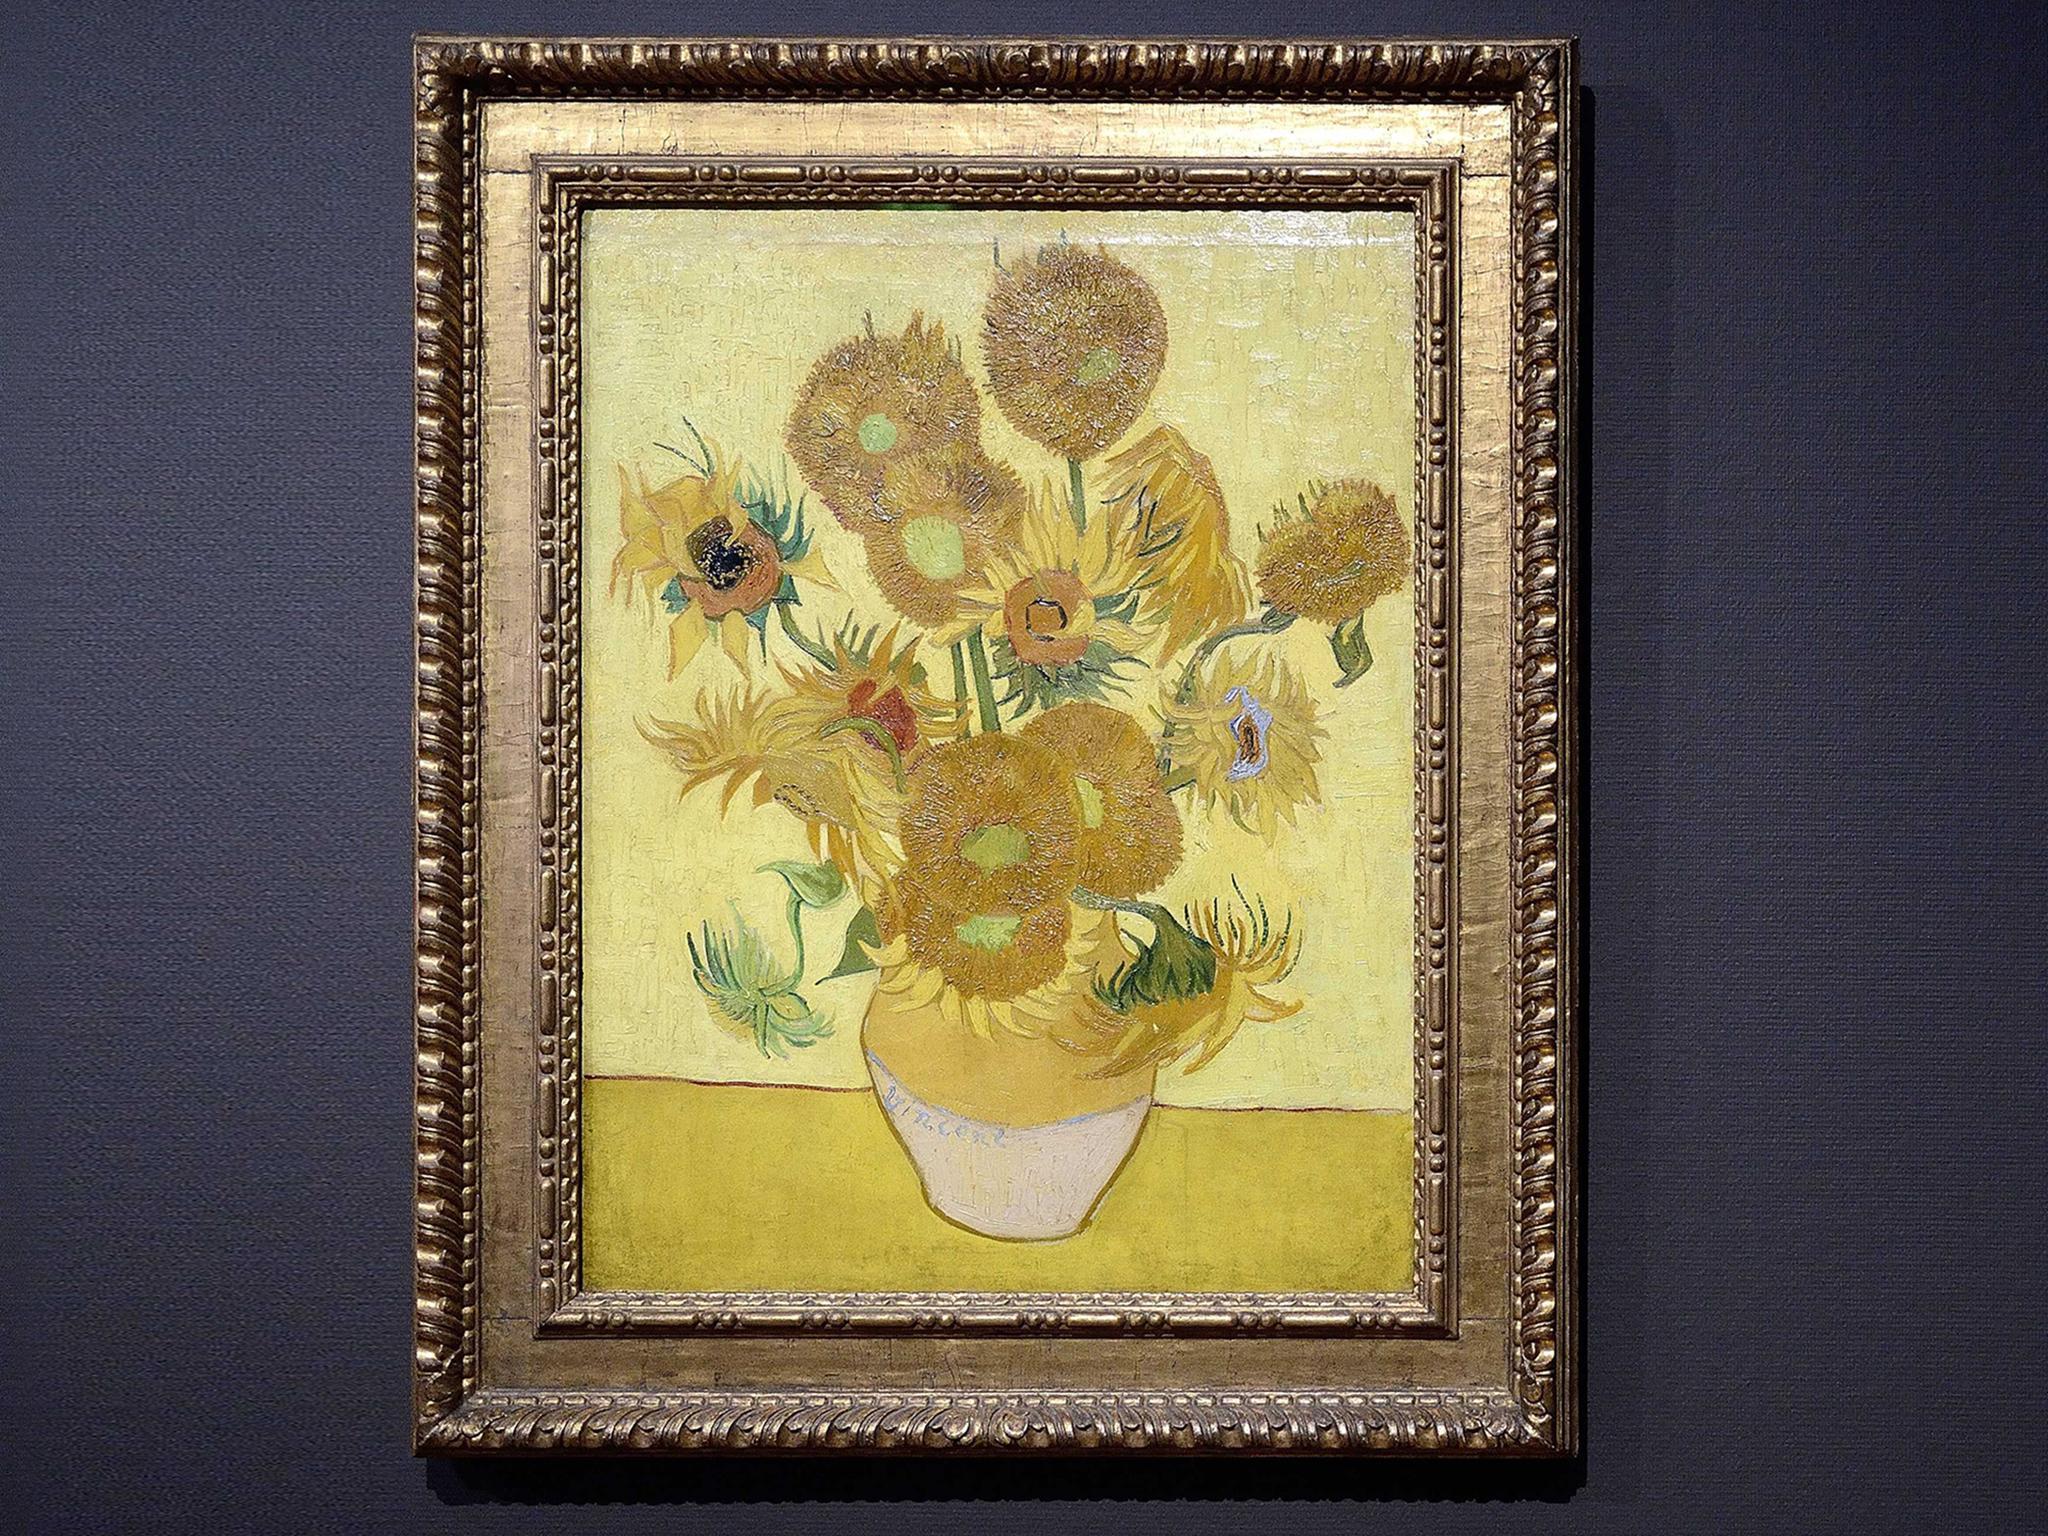 Van Gogh's Sunflowers: The misunderstood masterpiece